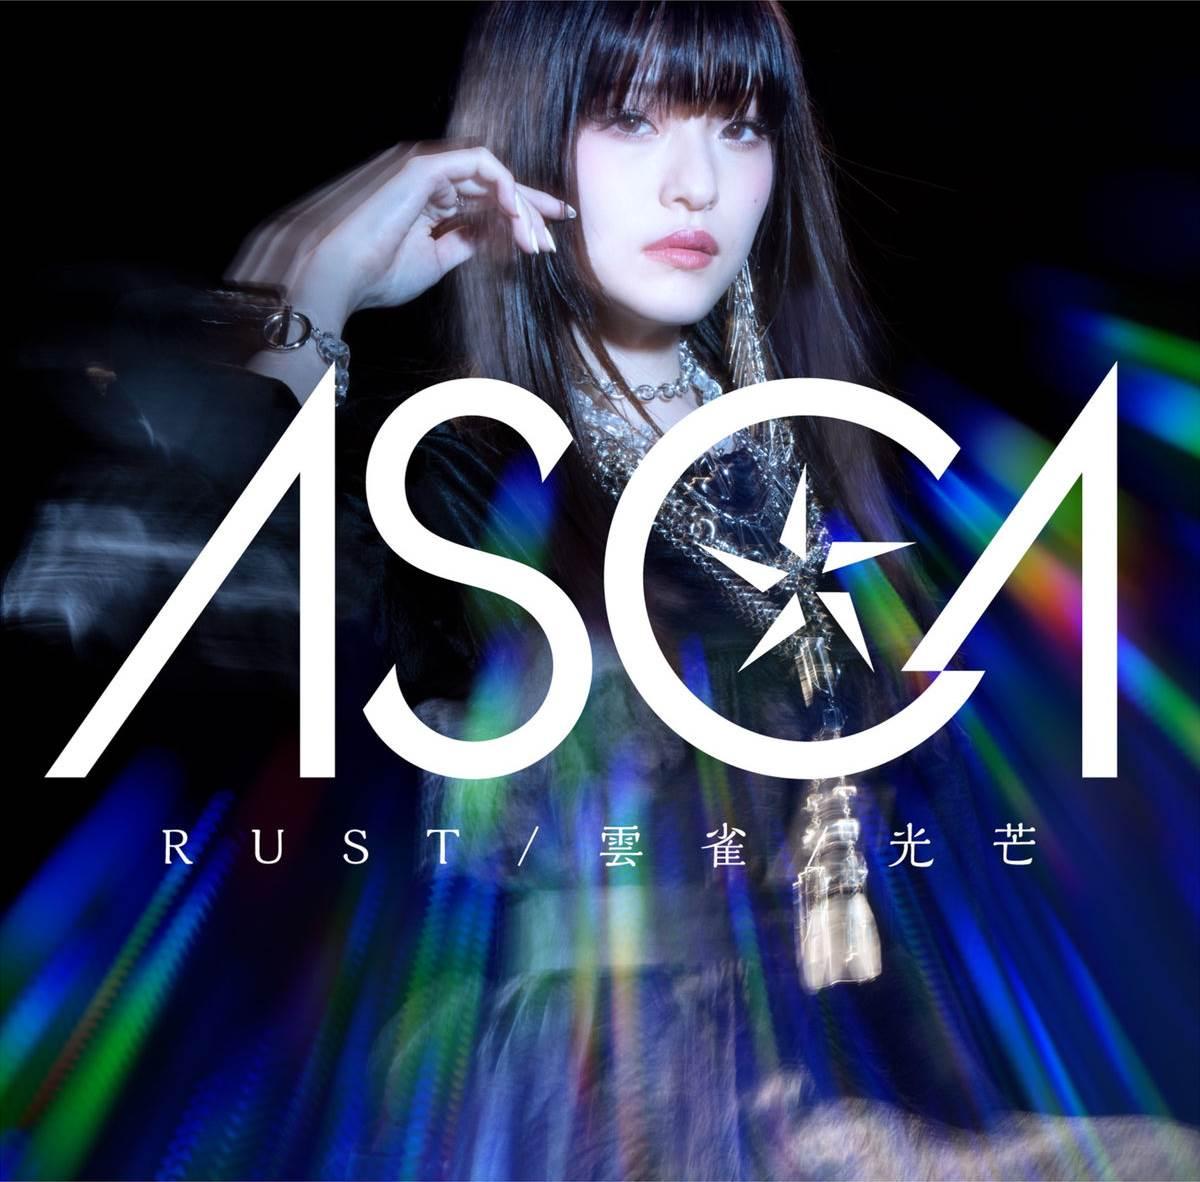 『ASCA光芒』収録の『RUST / 雲雀 / 光芒』ジャケット